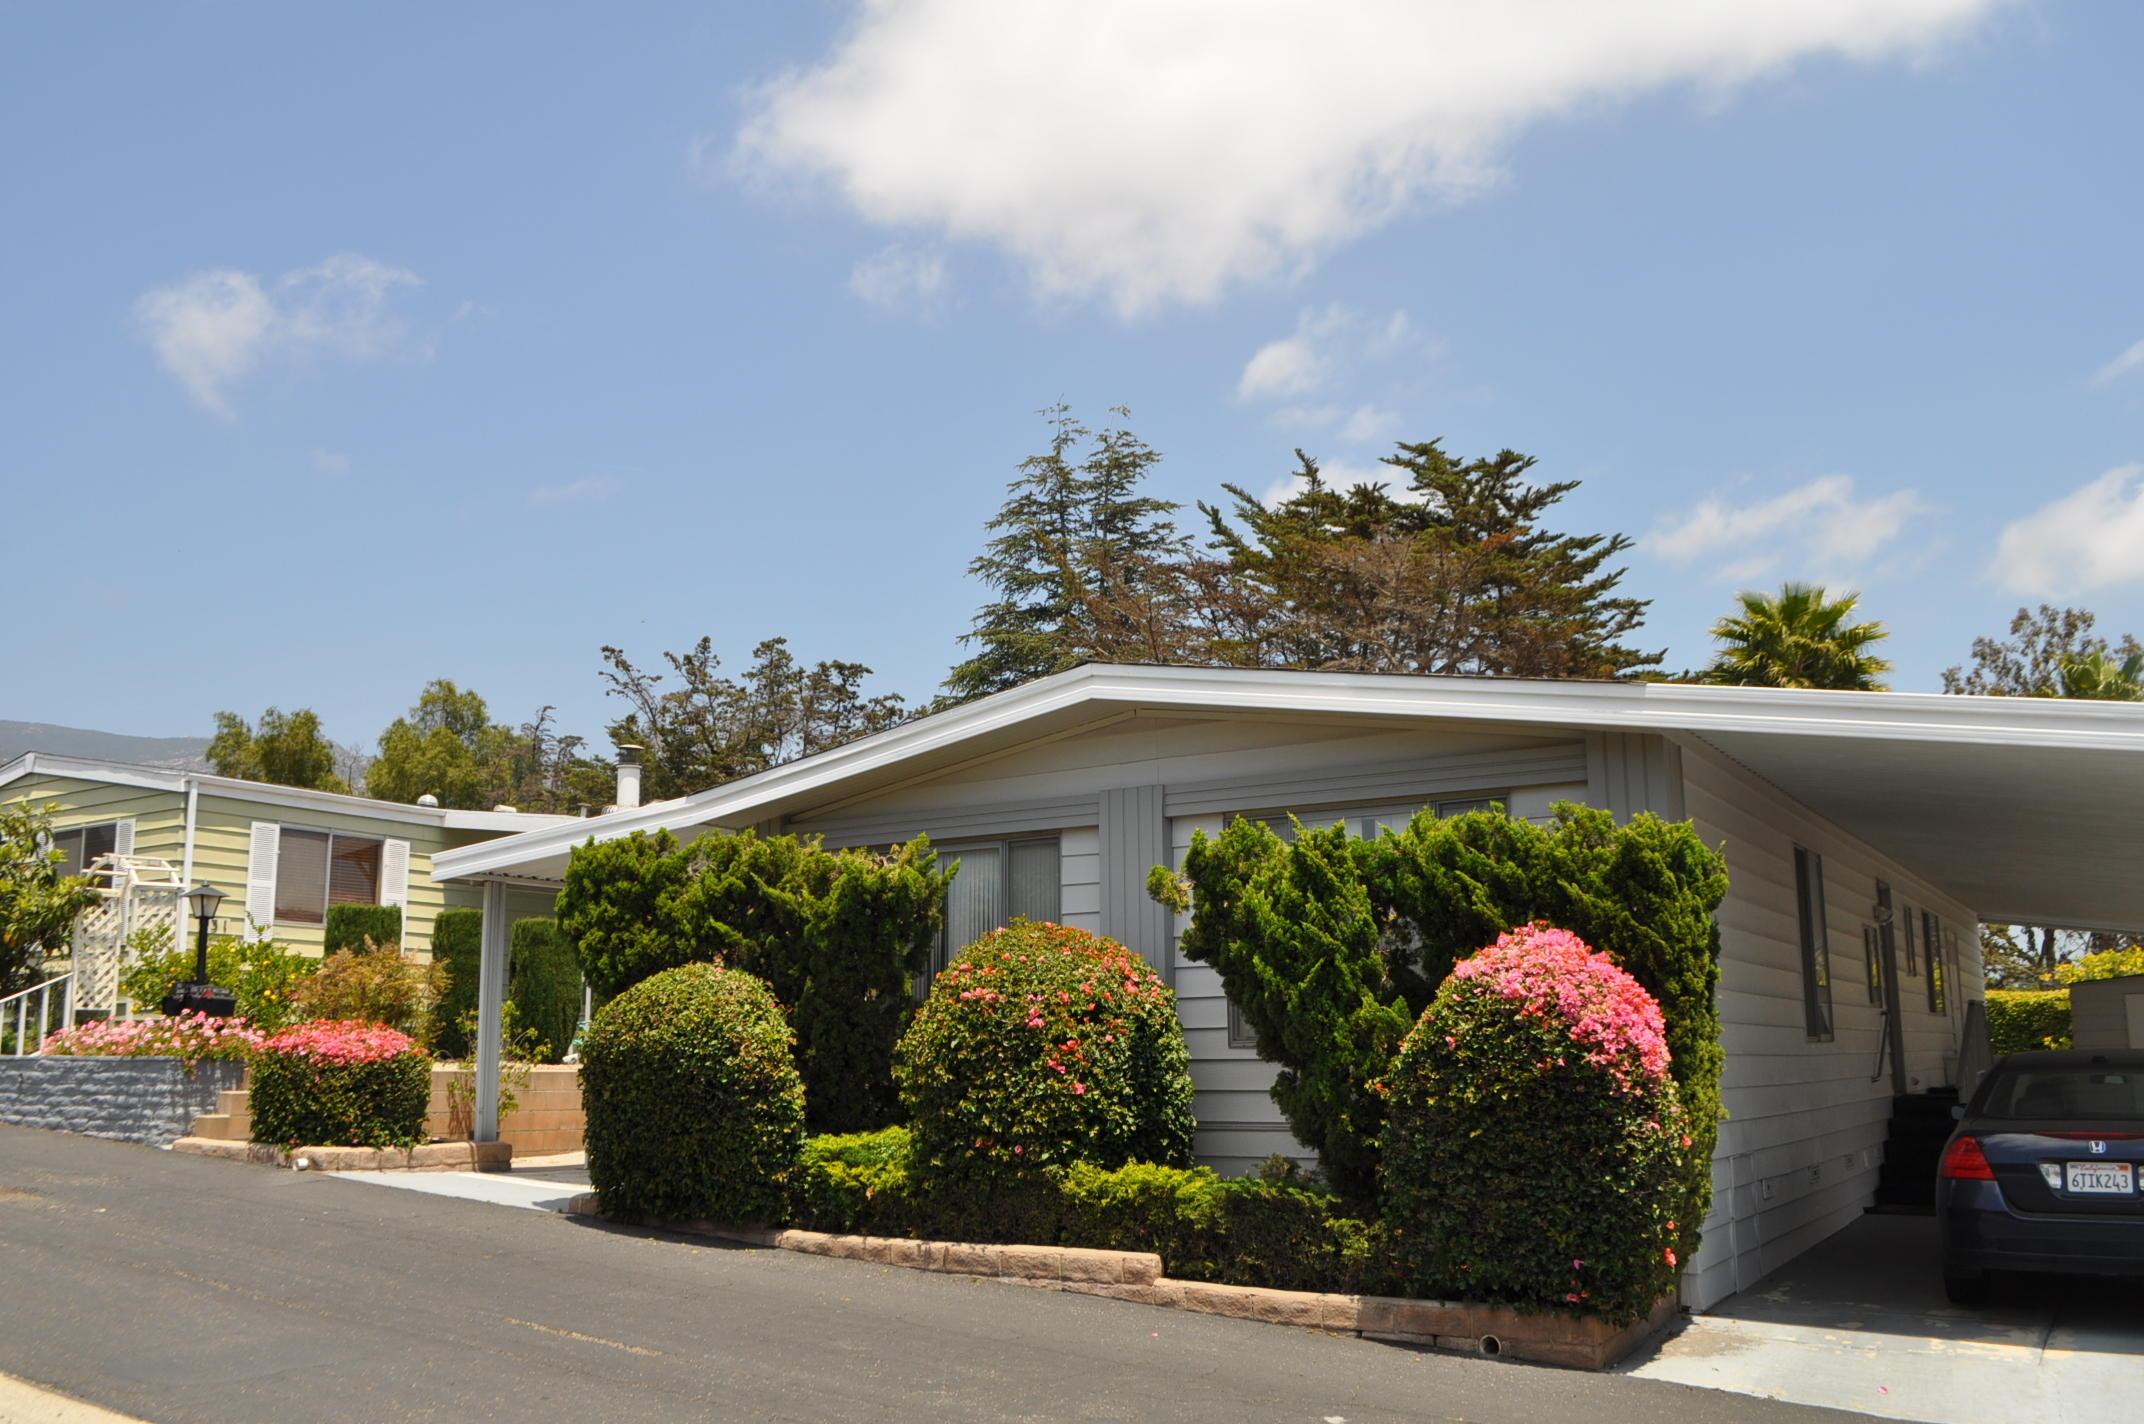 Property photo for 340 Old Mill Rd #130 Santa Barbara, California 93110 - 18-3600